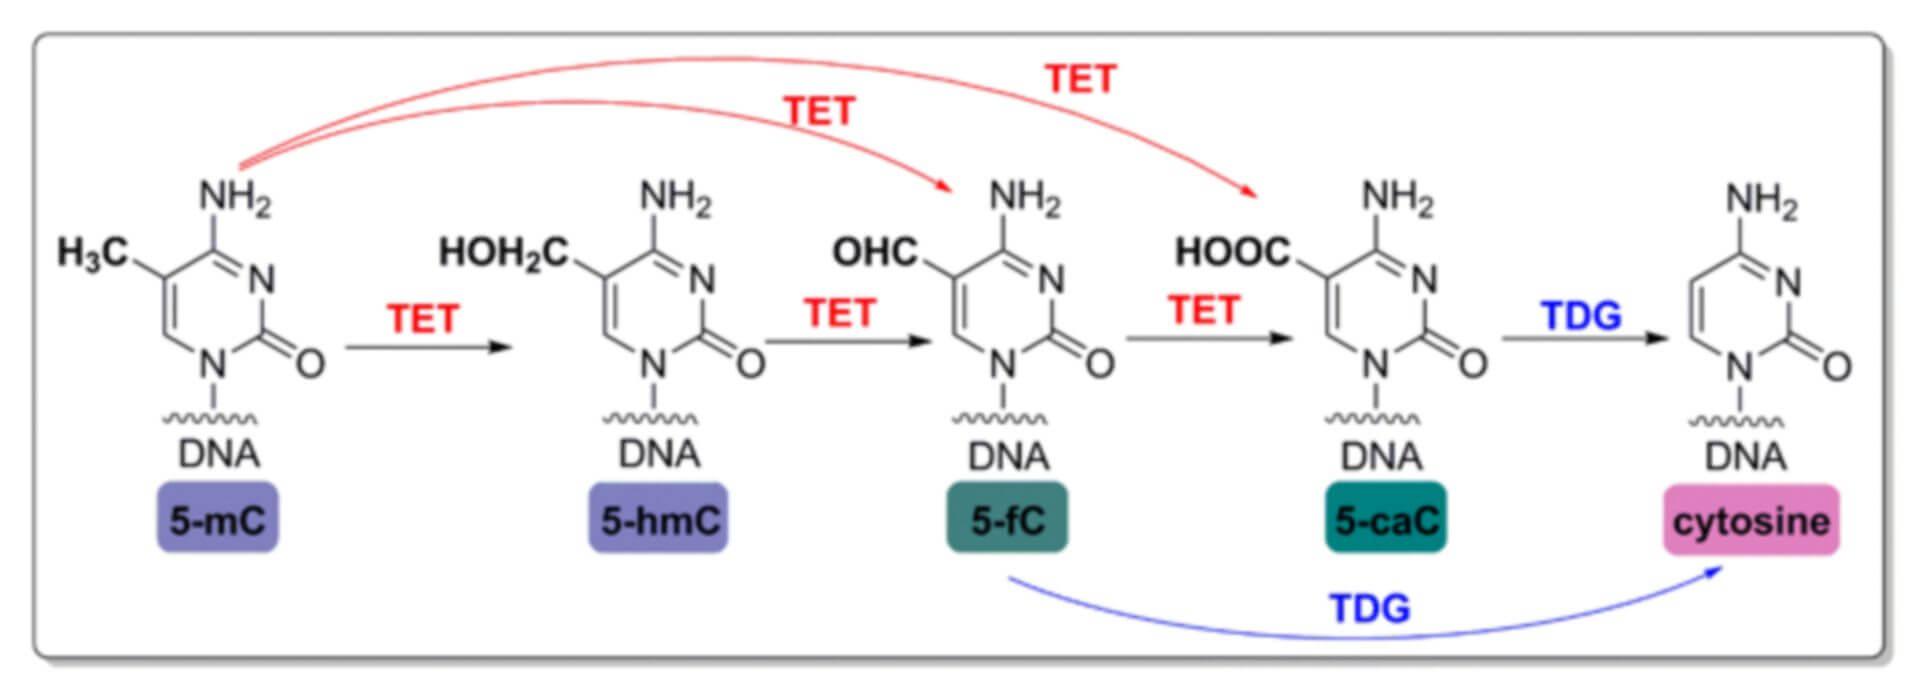 DNA Demethylase Inhibitor Screening